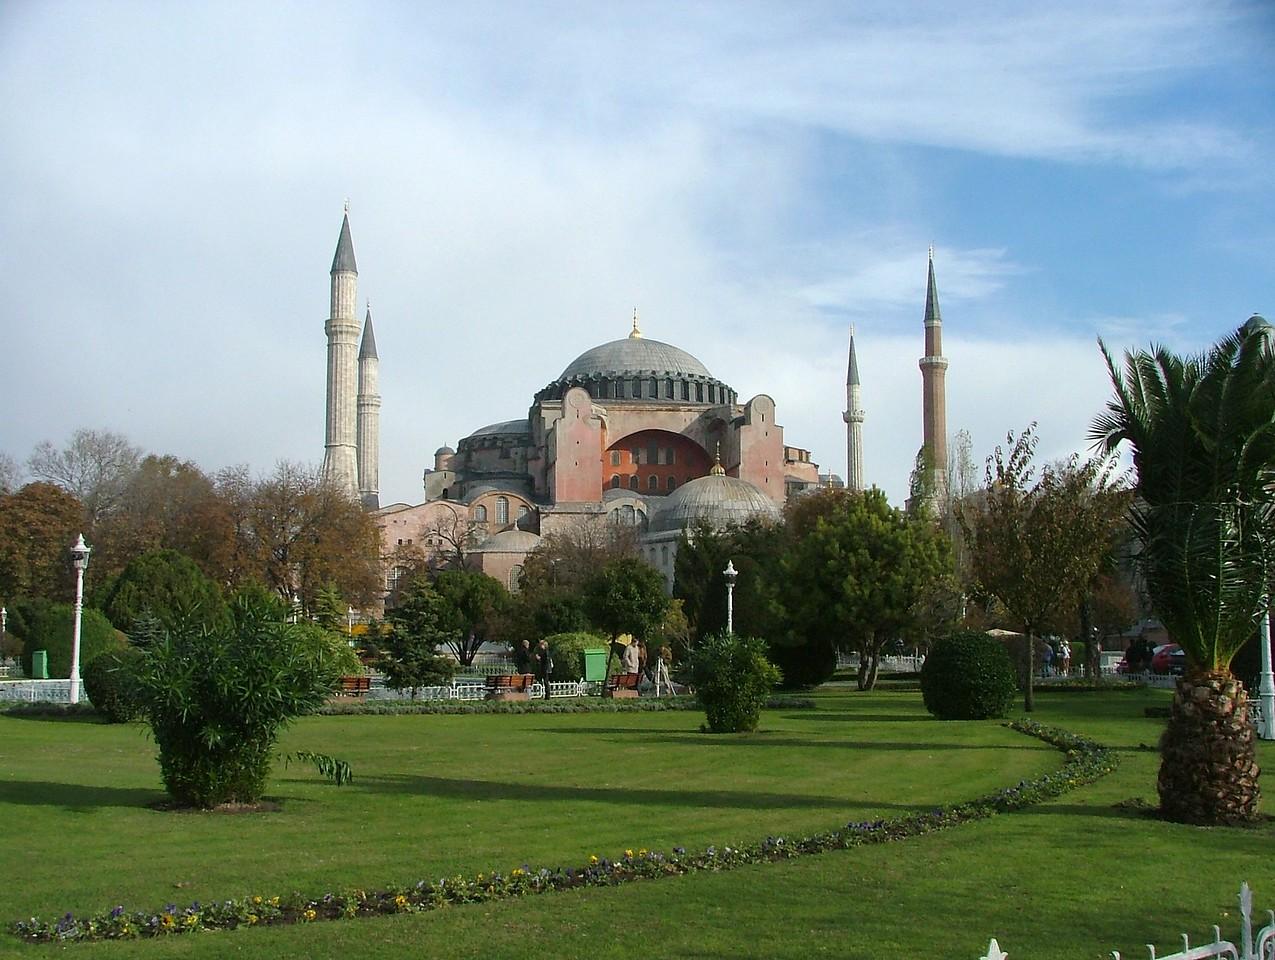 Aya Sofya, Sultanahmet, Istanbul